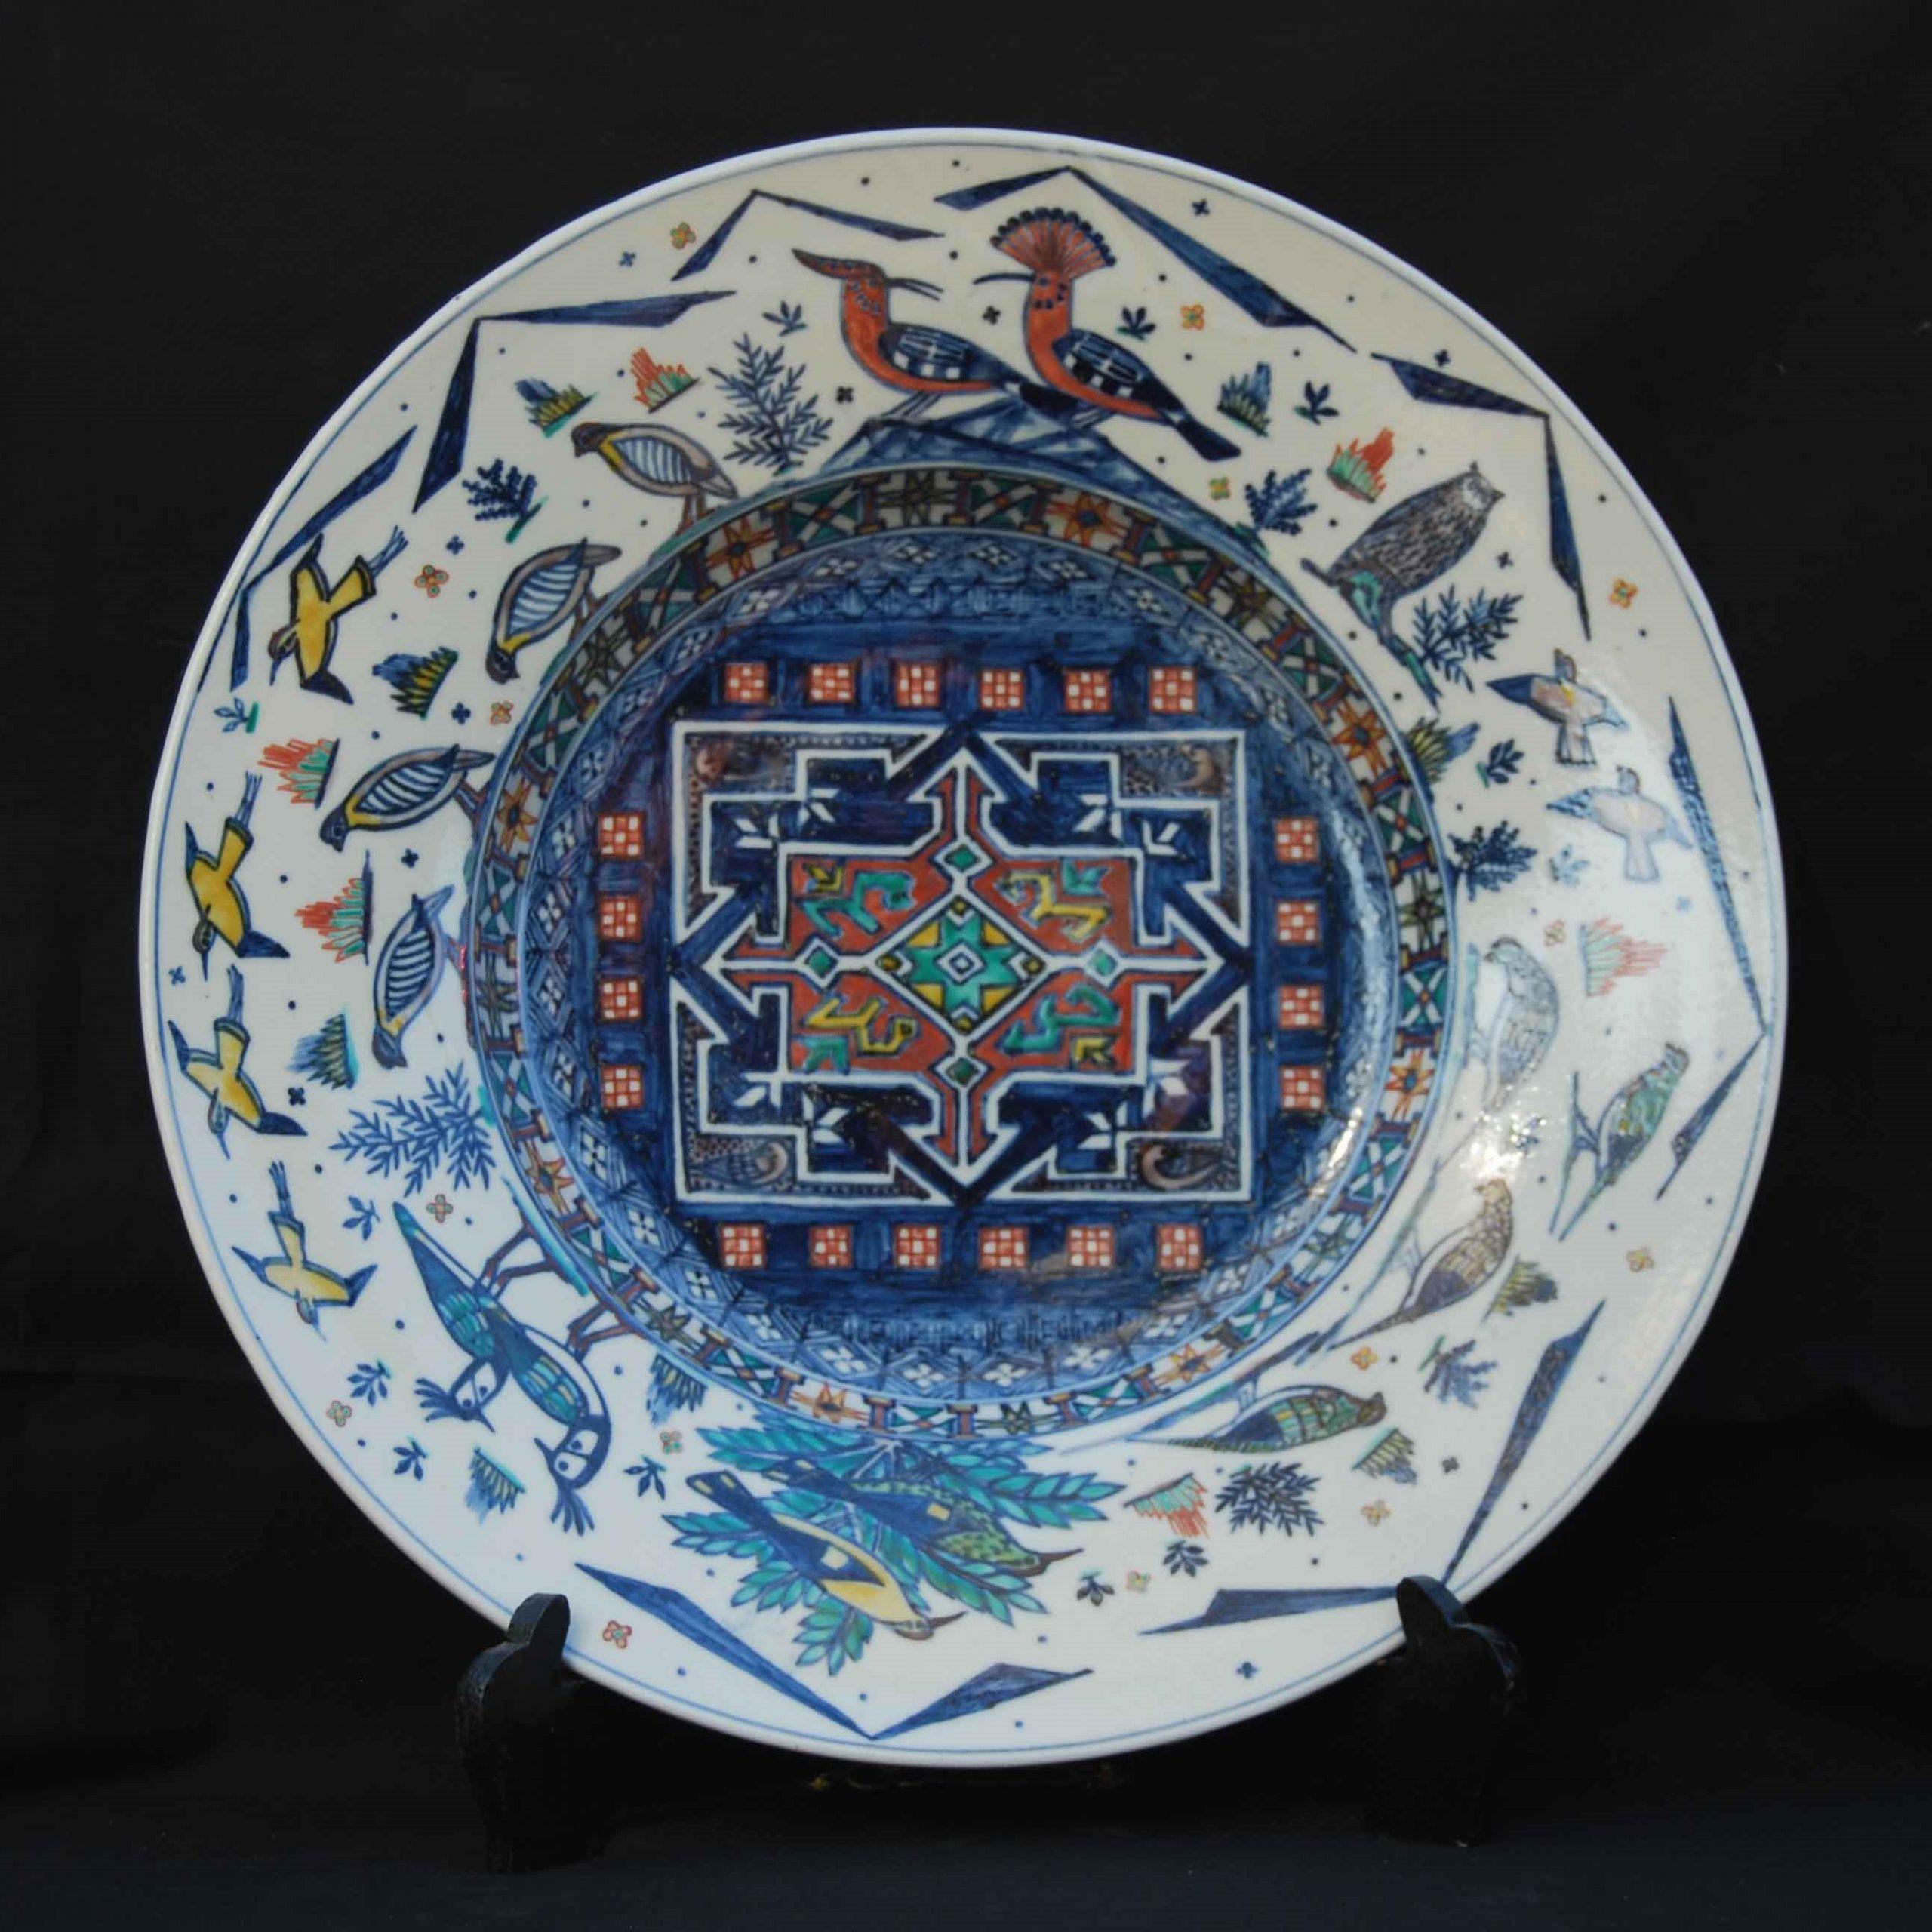 Russell Coates - Underglaze blue enamelled porcelain dish